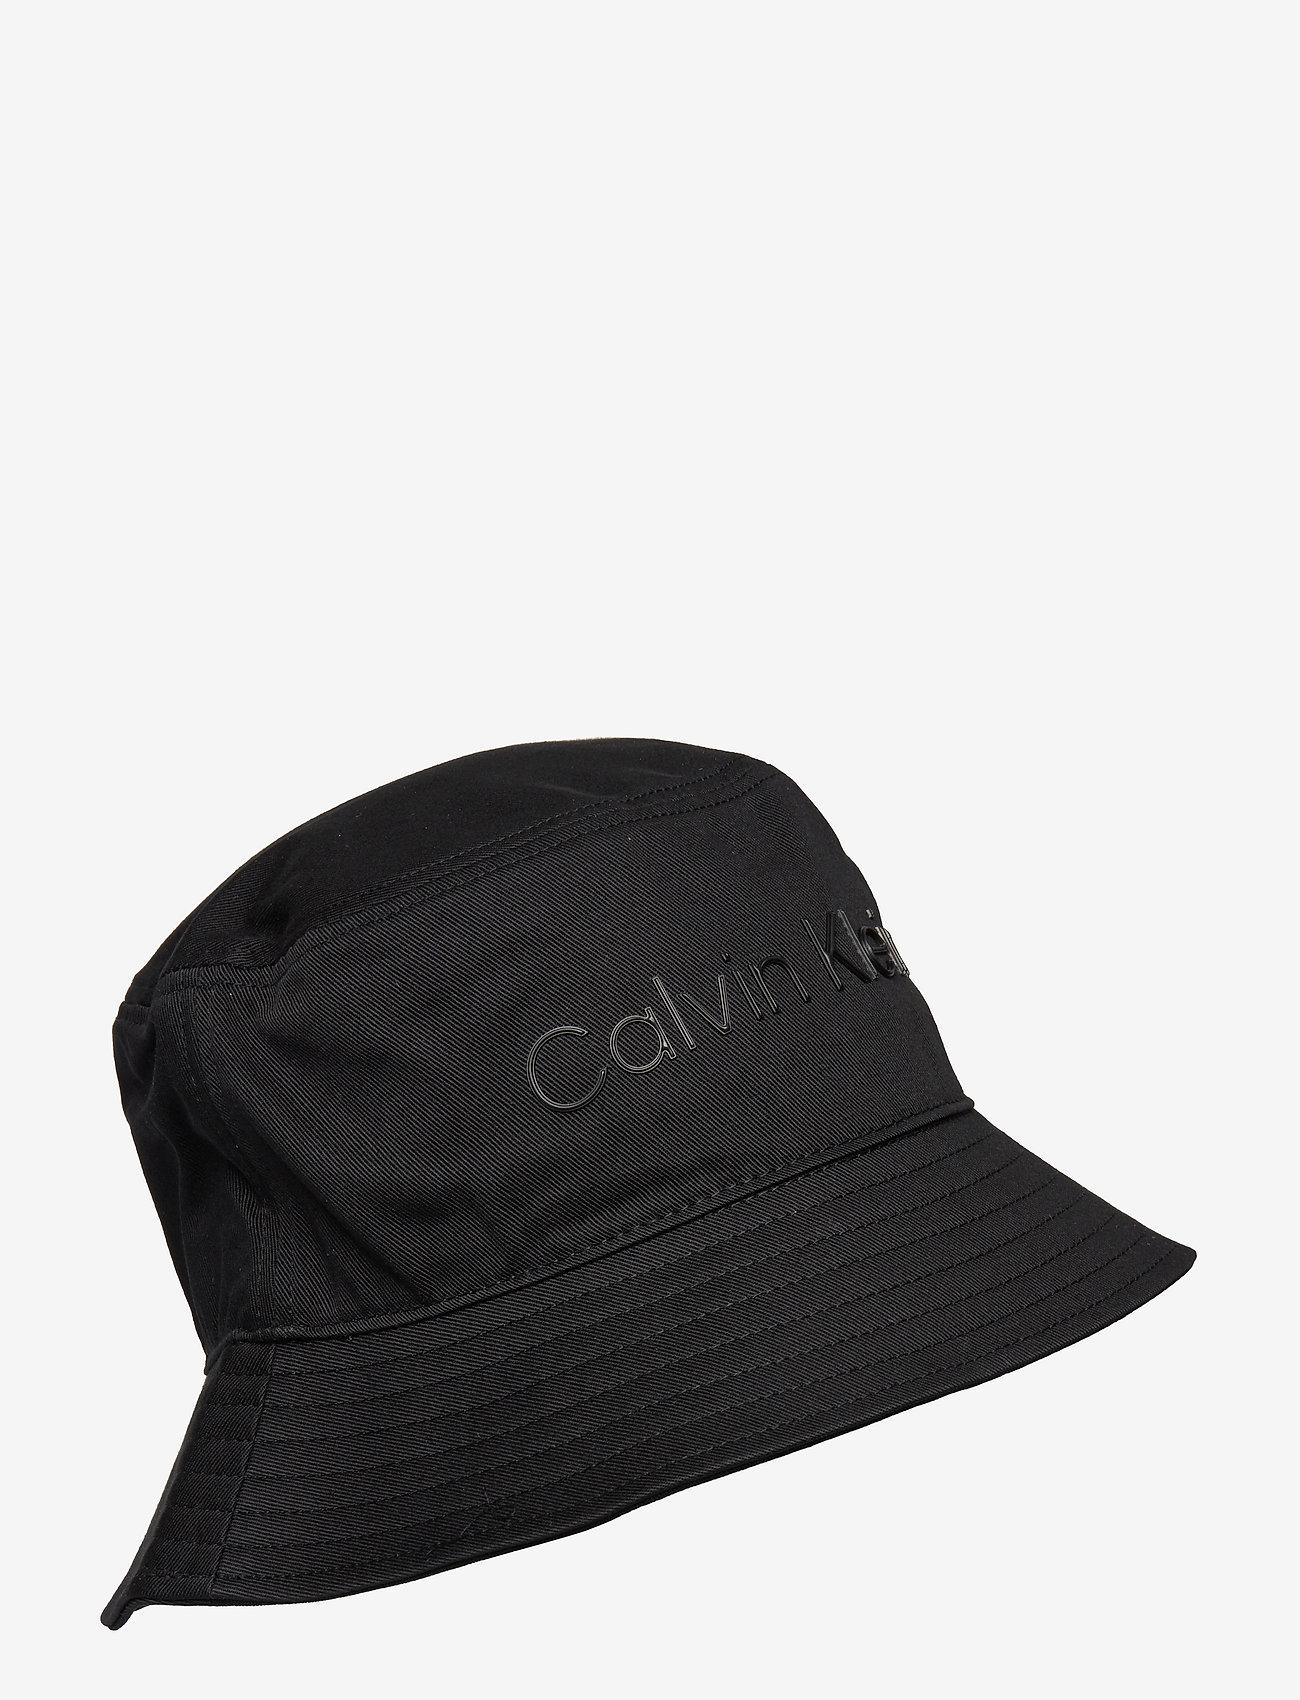 Calvin Klein - BUCKET HAT - bucket hats - ck black - 0